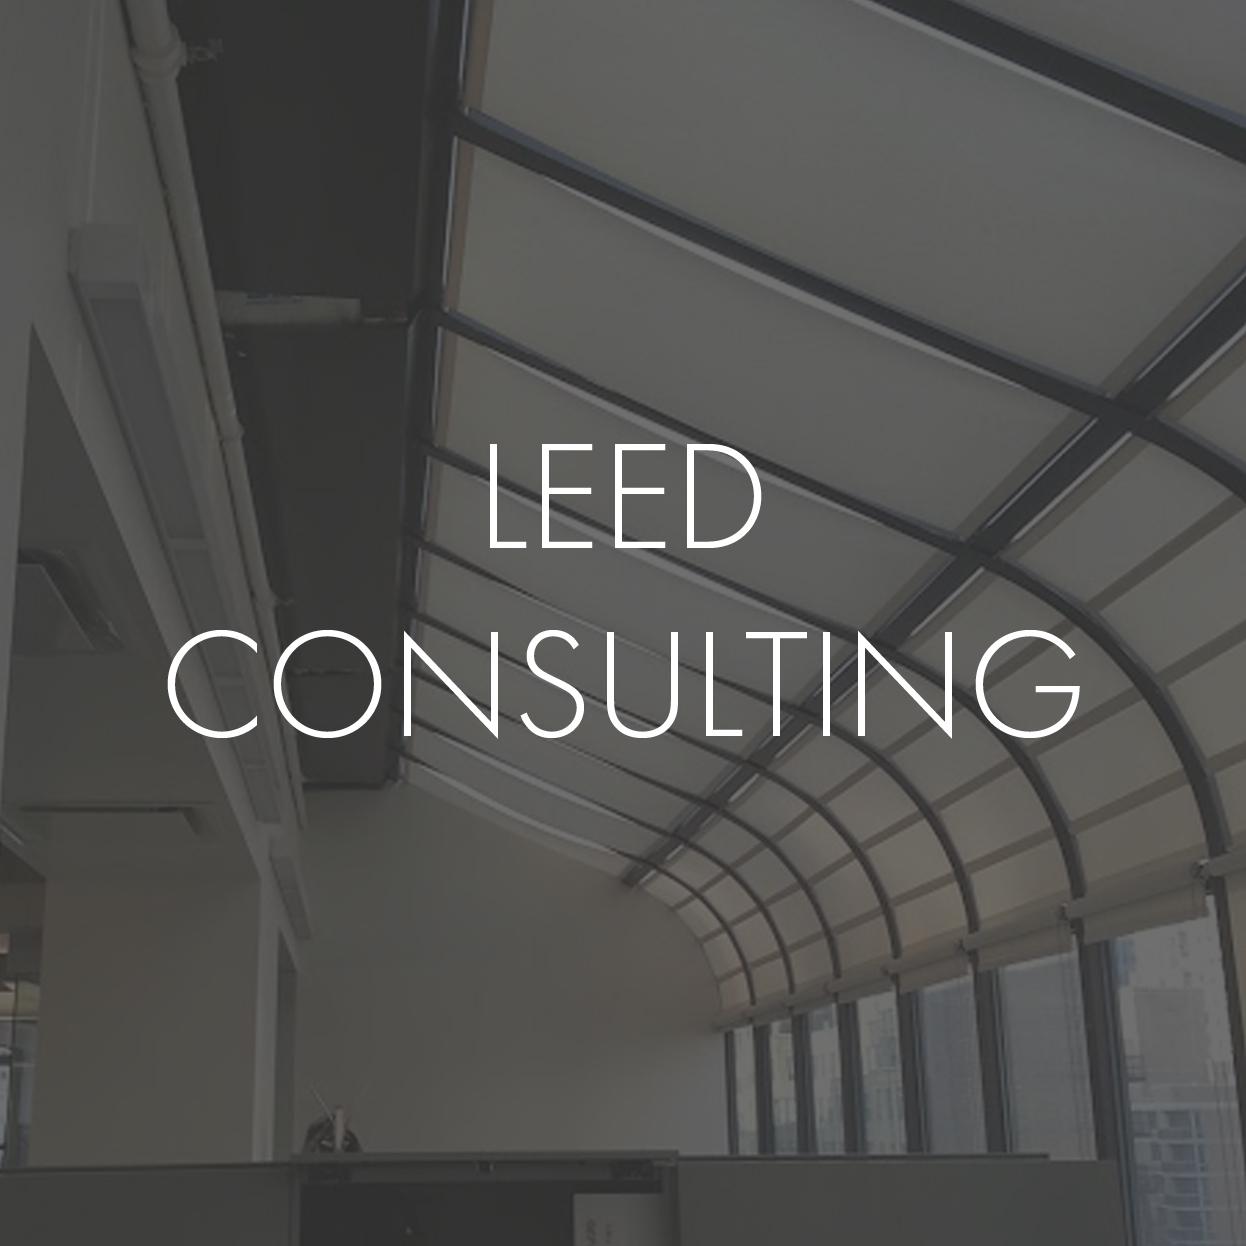 THUMBNAIL_LEED consulting.jpg